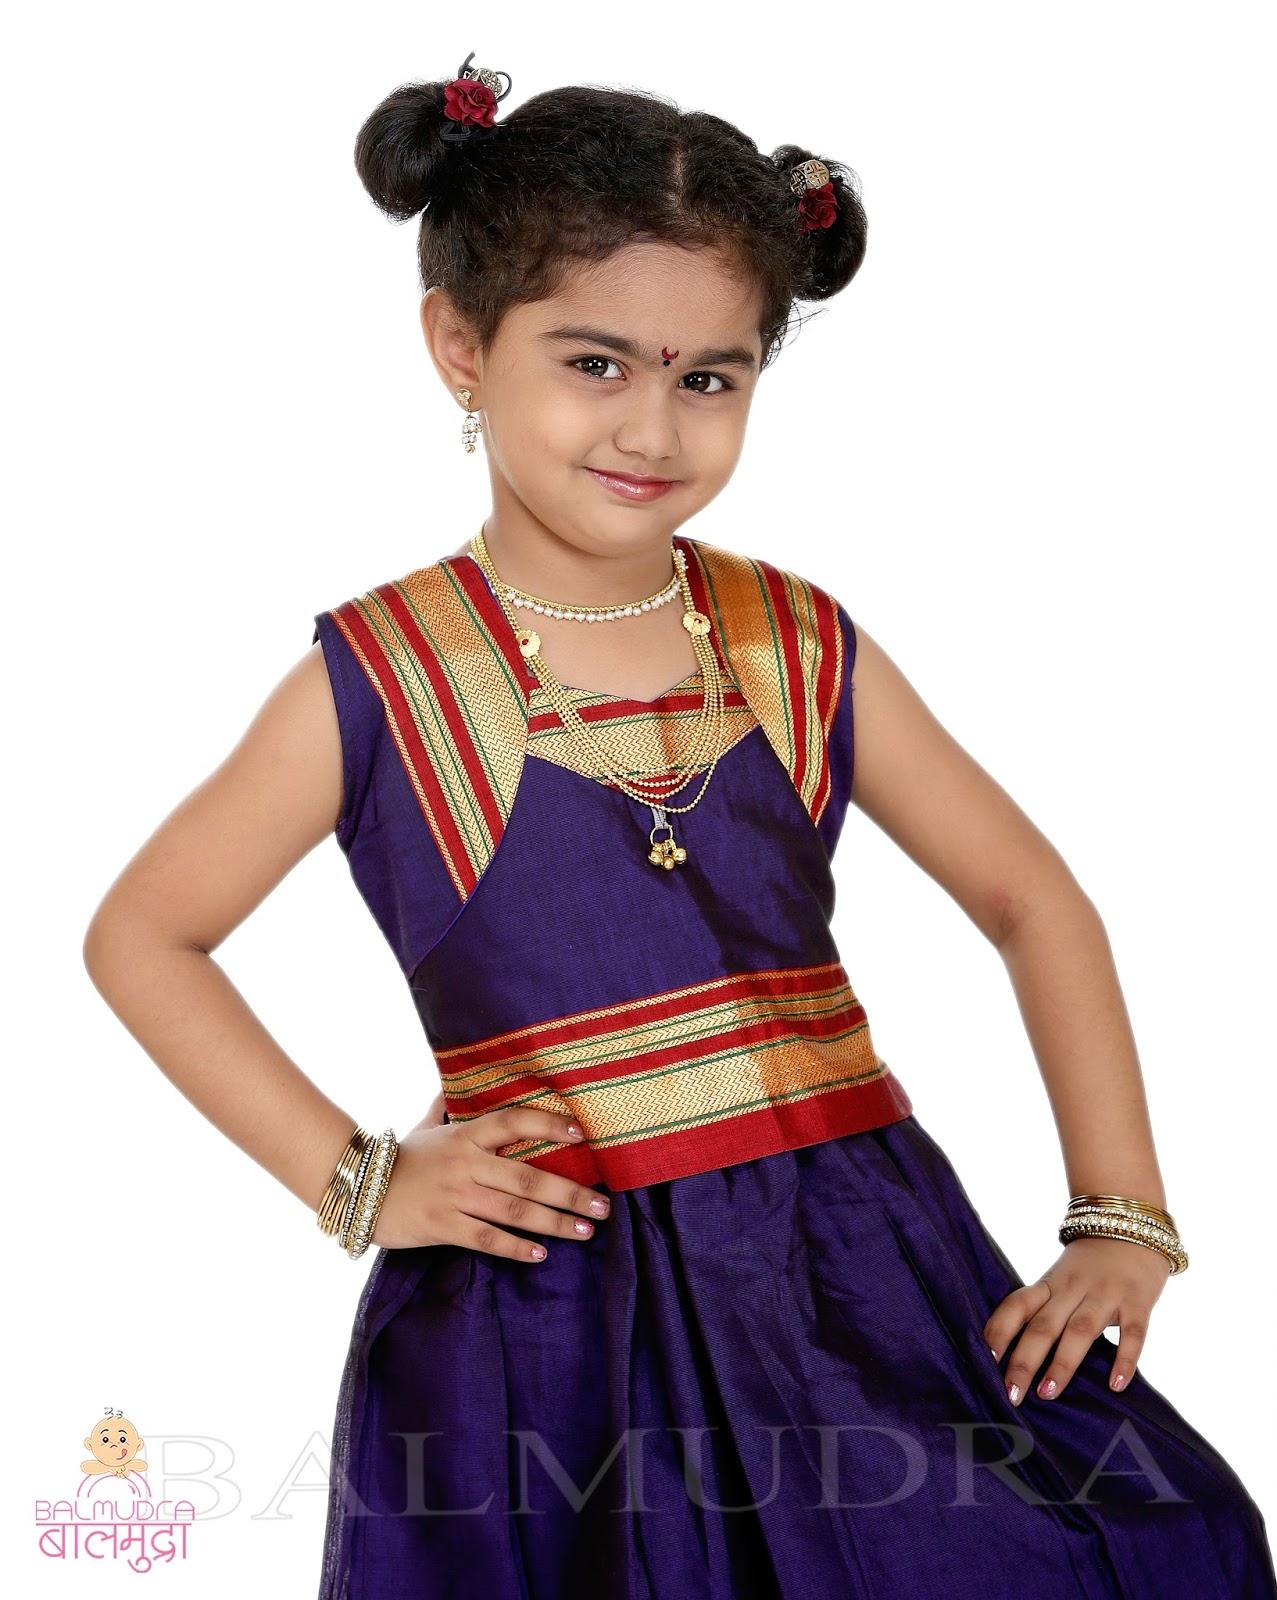 95729e64d Balmudra Studio - PUNE - BabyPhotographer in Pune   www.balmudra.com ...